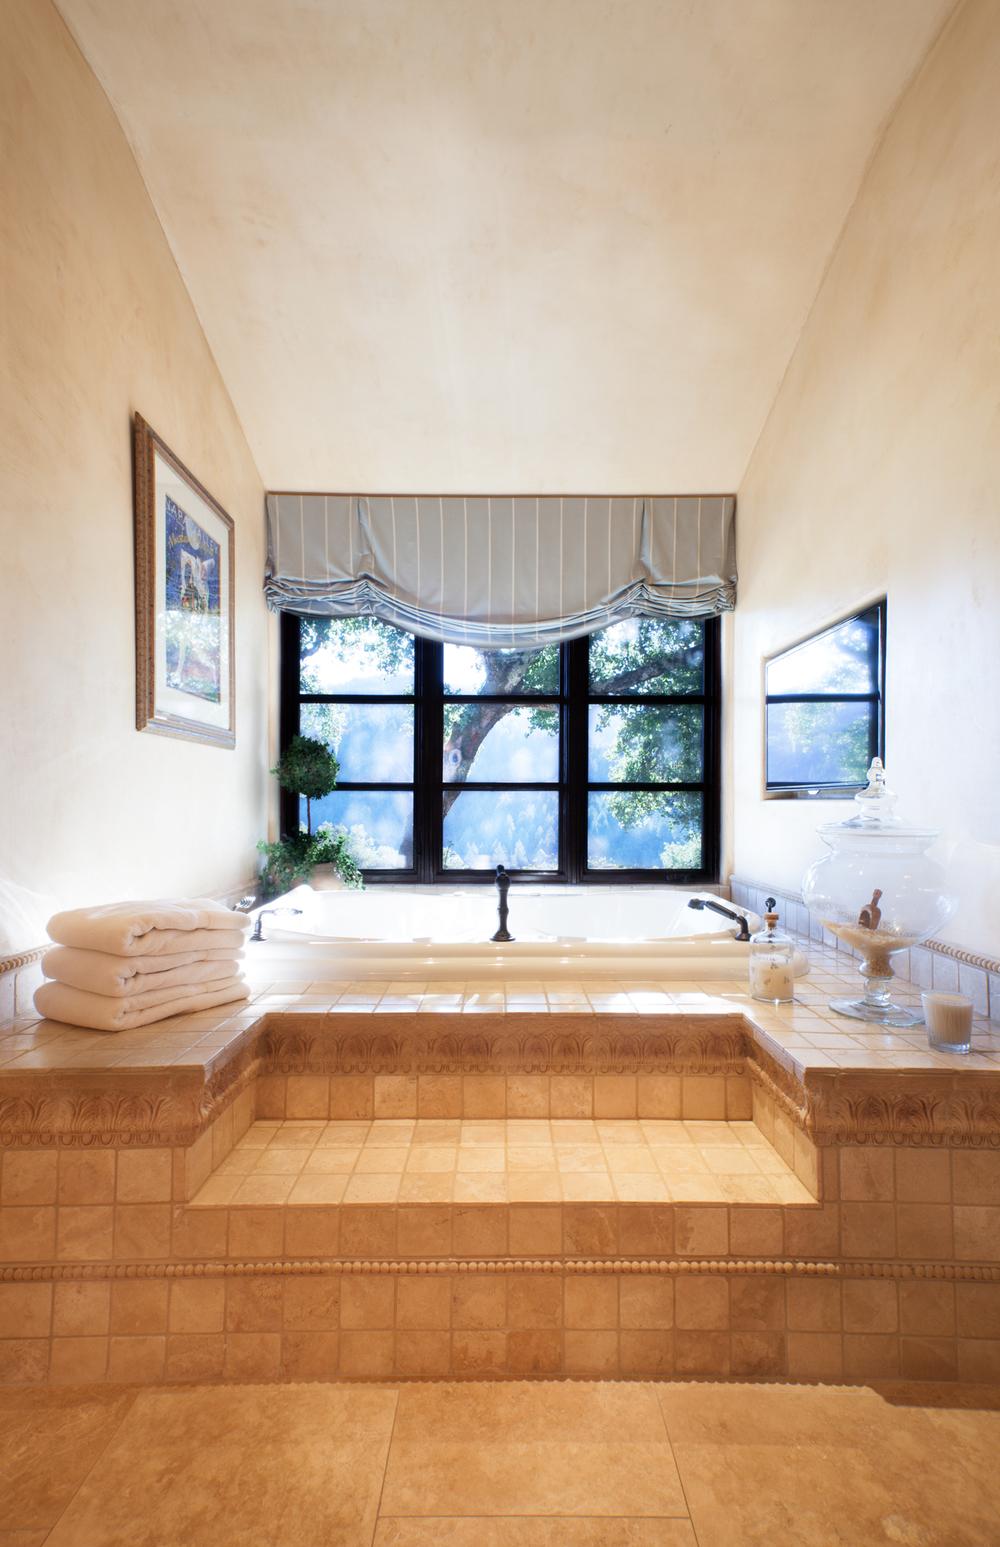 CHATEAU YEAKEY - MASTER BATH